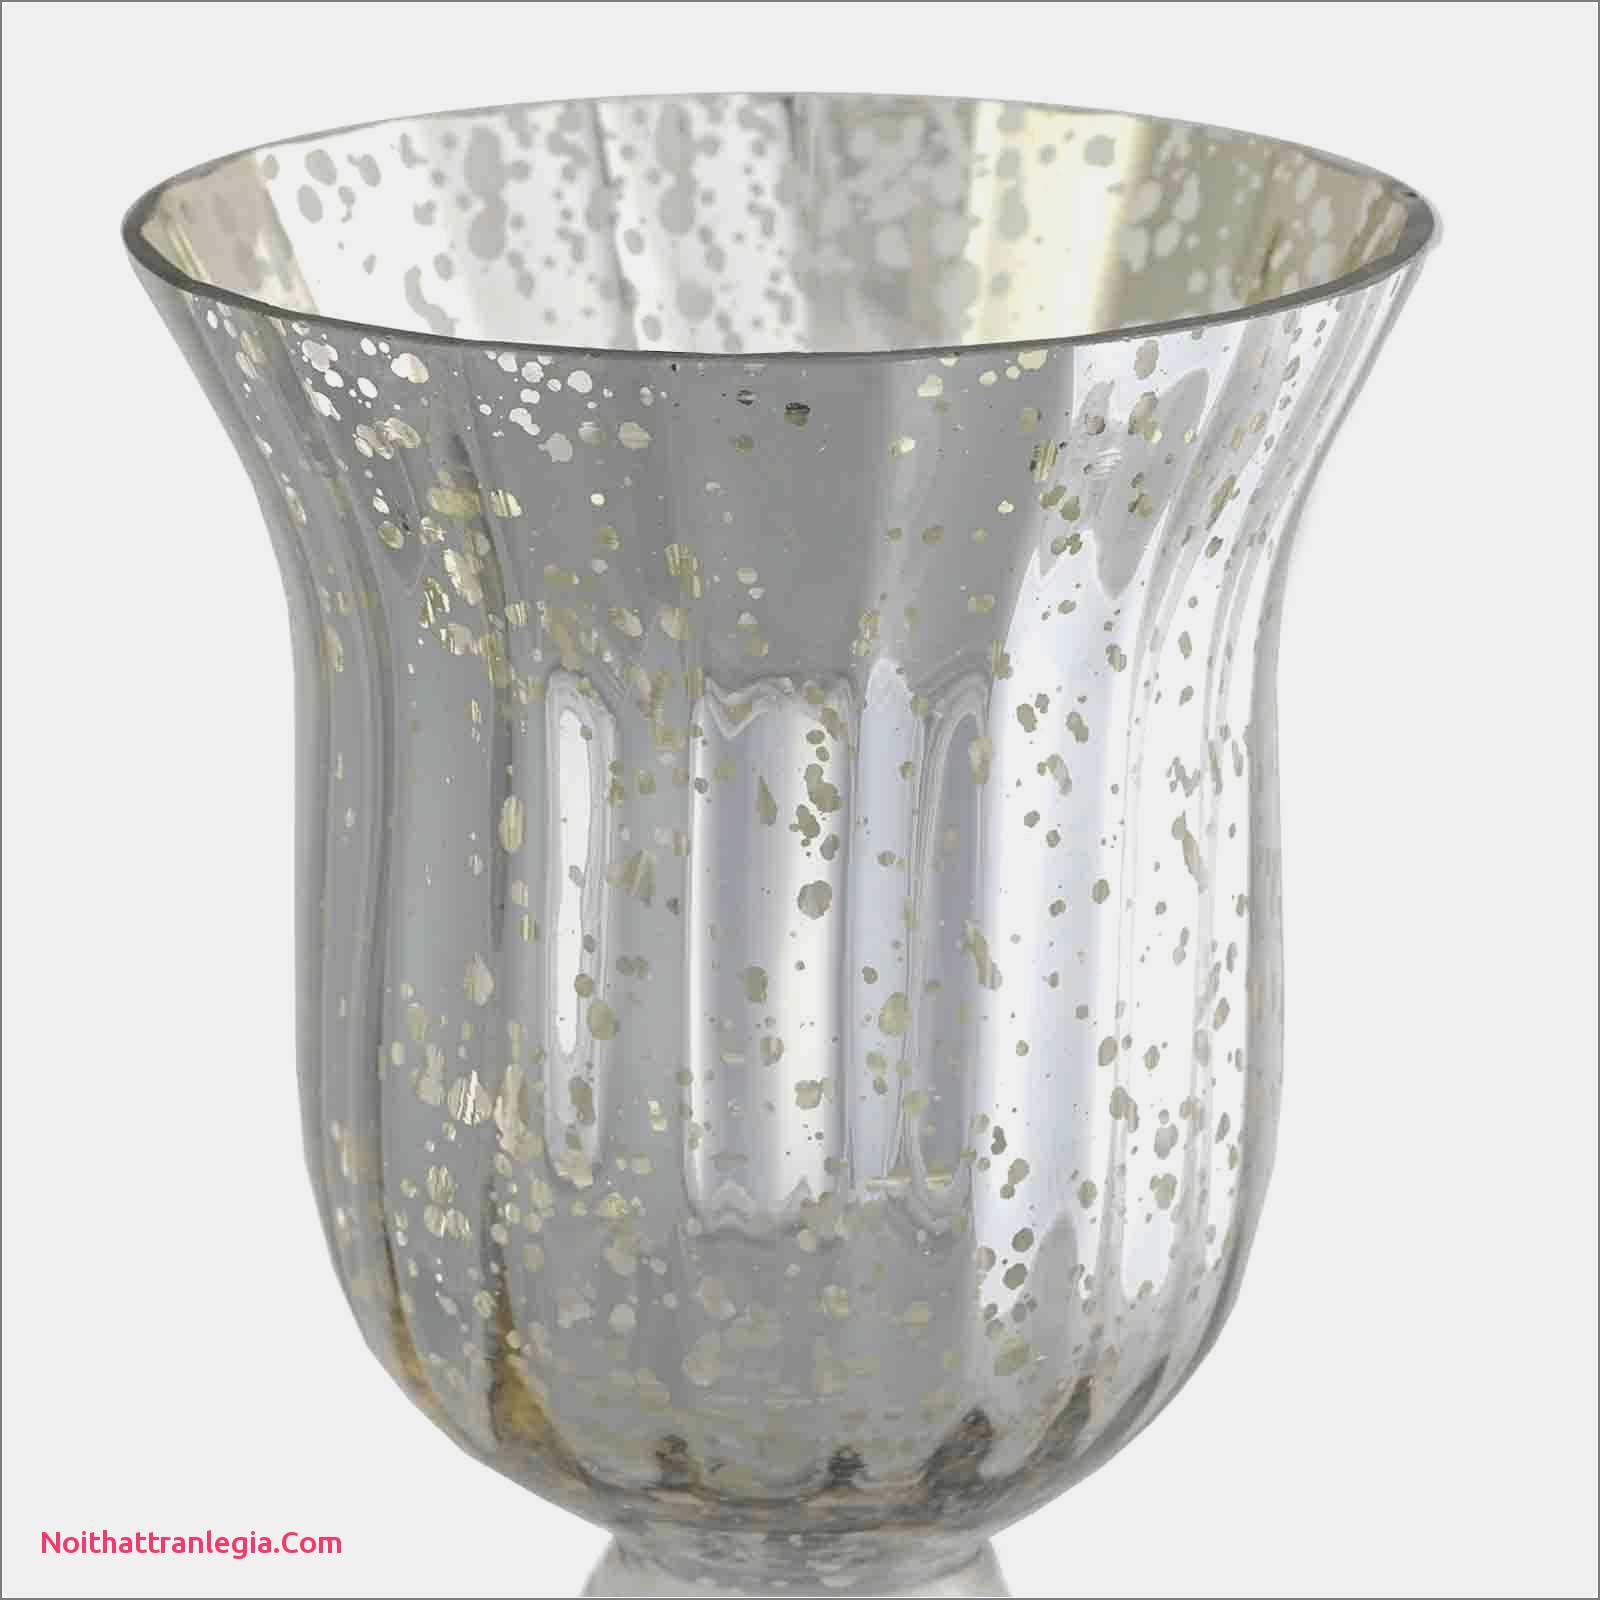 antique black glass vase of 20 wedding vases noithattranlegia vases design with wedding guest gift ideas inspirational candles for wedding favors superb pe s5h vases candle vase i